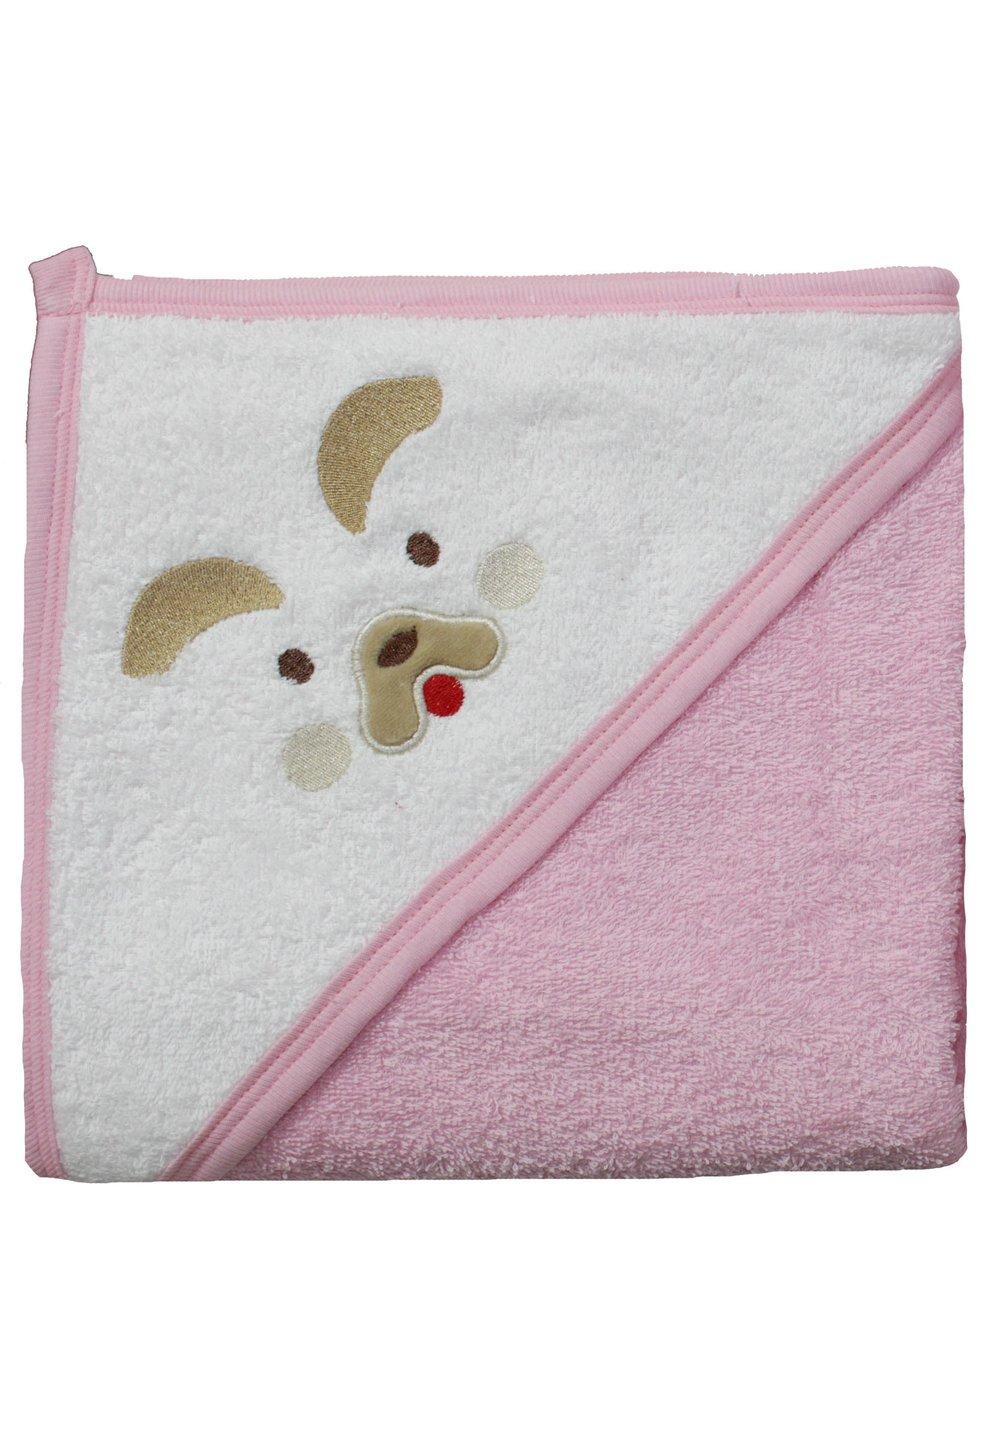 Prosop bumbac, roz, catelus, 80x100cm imagine